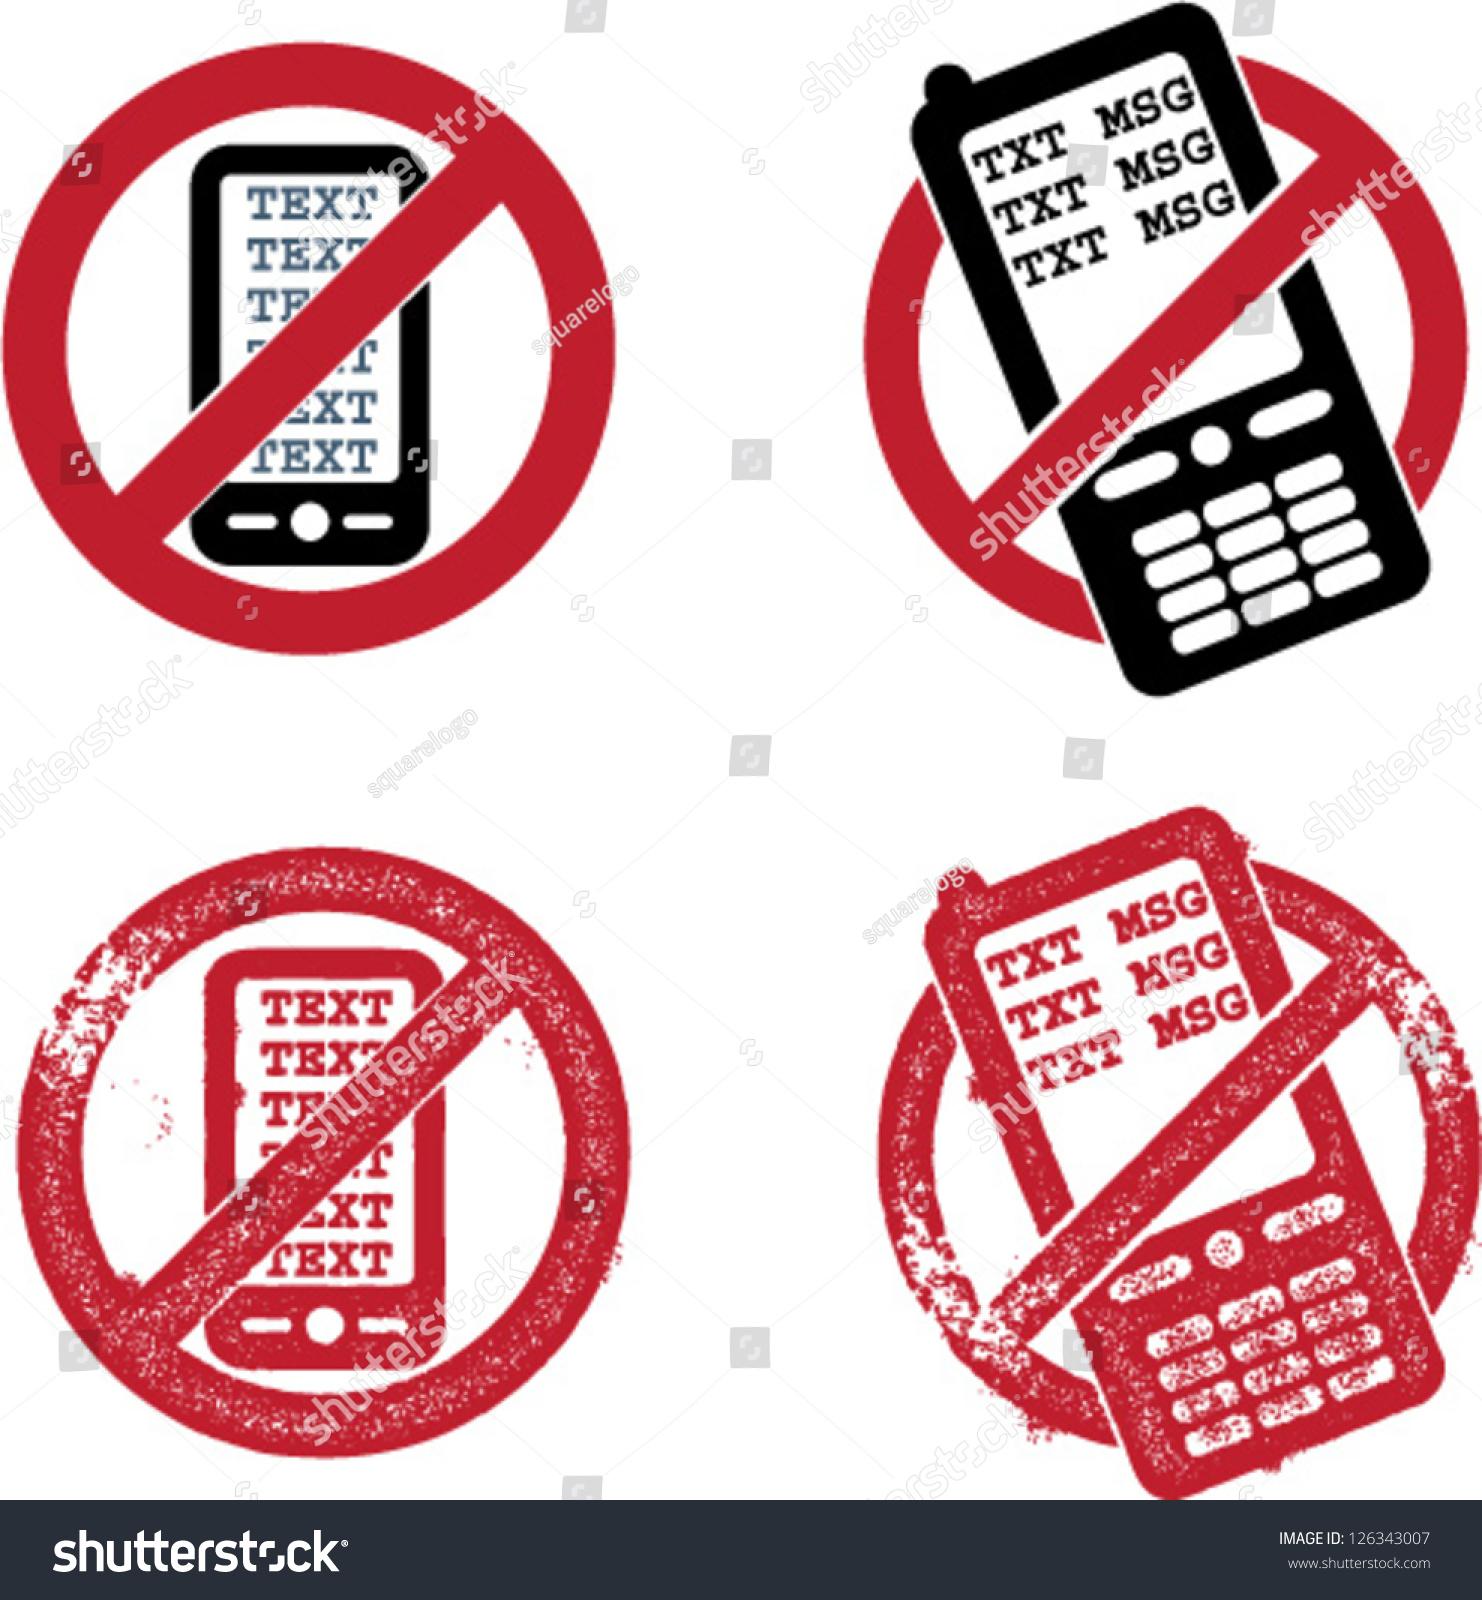 No texting signs symbols stock vector 126343007 shutterstock no texting signs symbols biocorpaavc